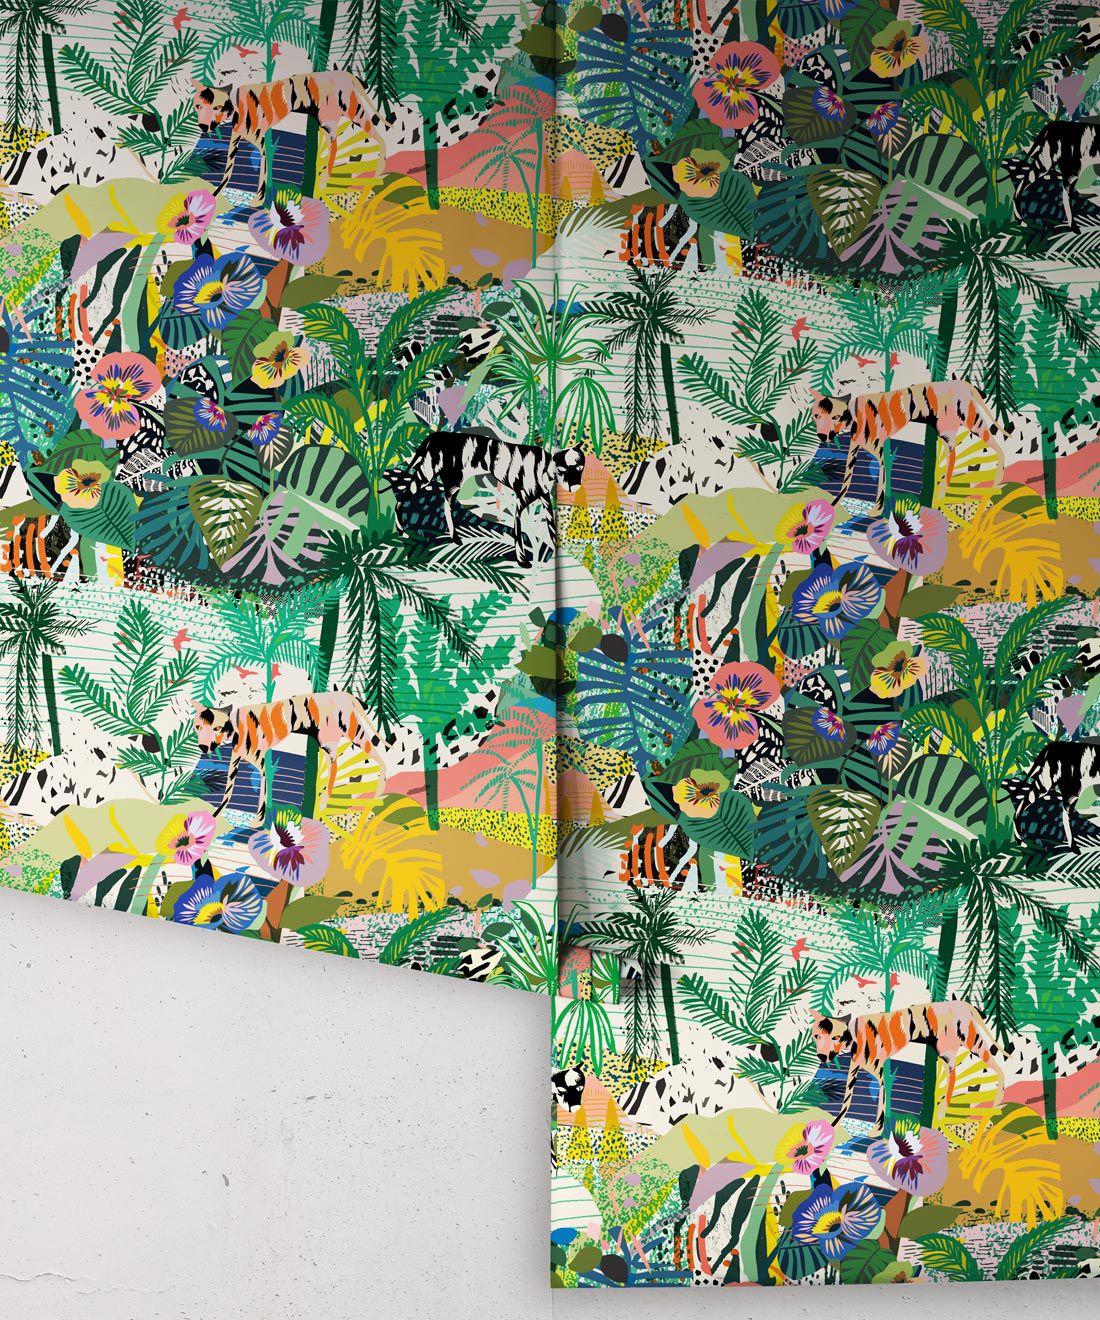 Utopia wallpaper • Colorful Tropical Wallpaper • Rolls